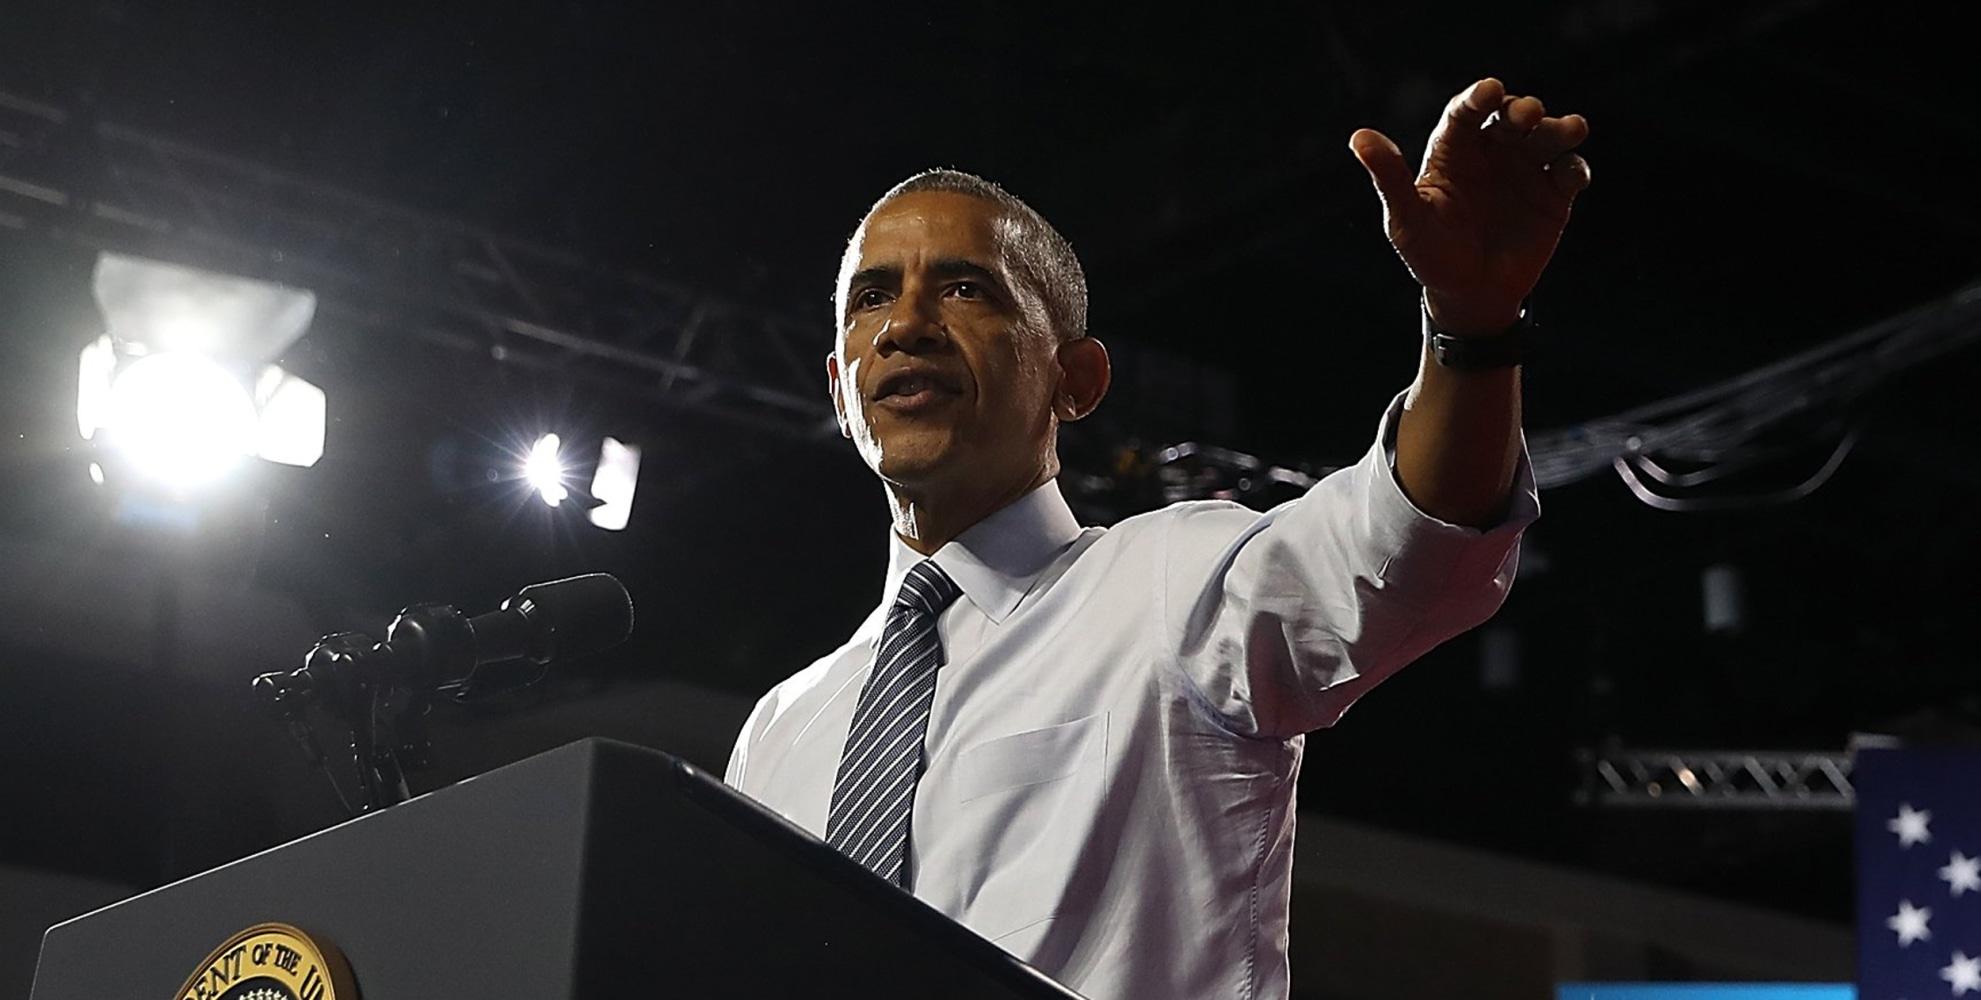 'My President': Celebrities bid Obama farewell